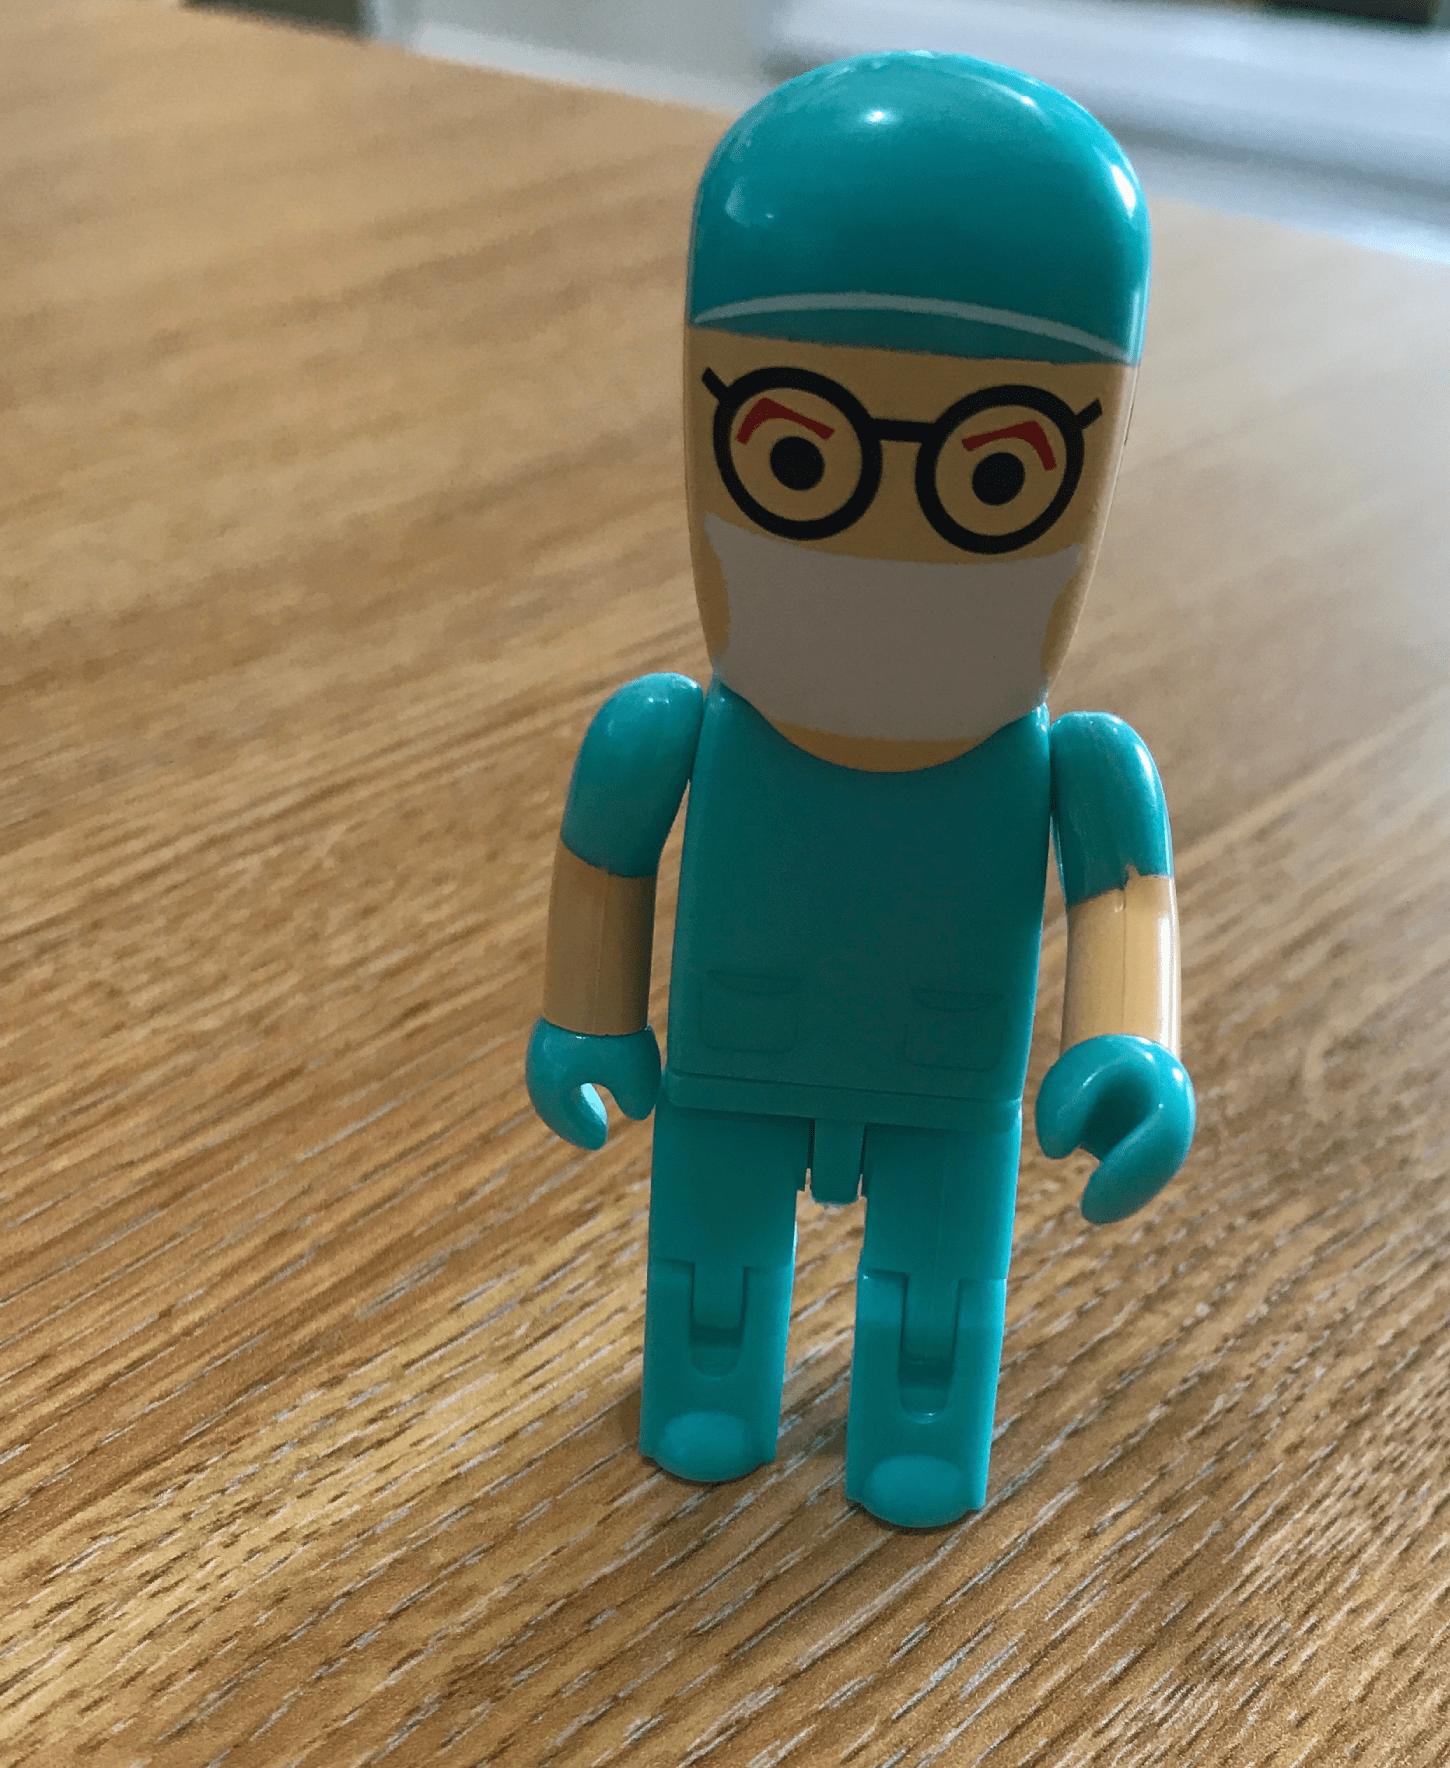 Lego Nurse image